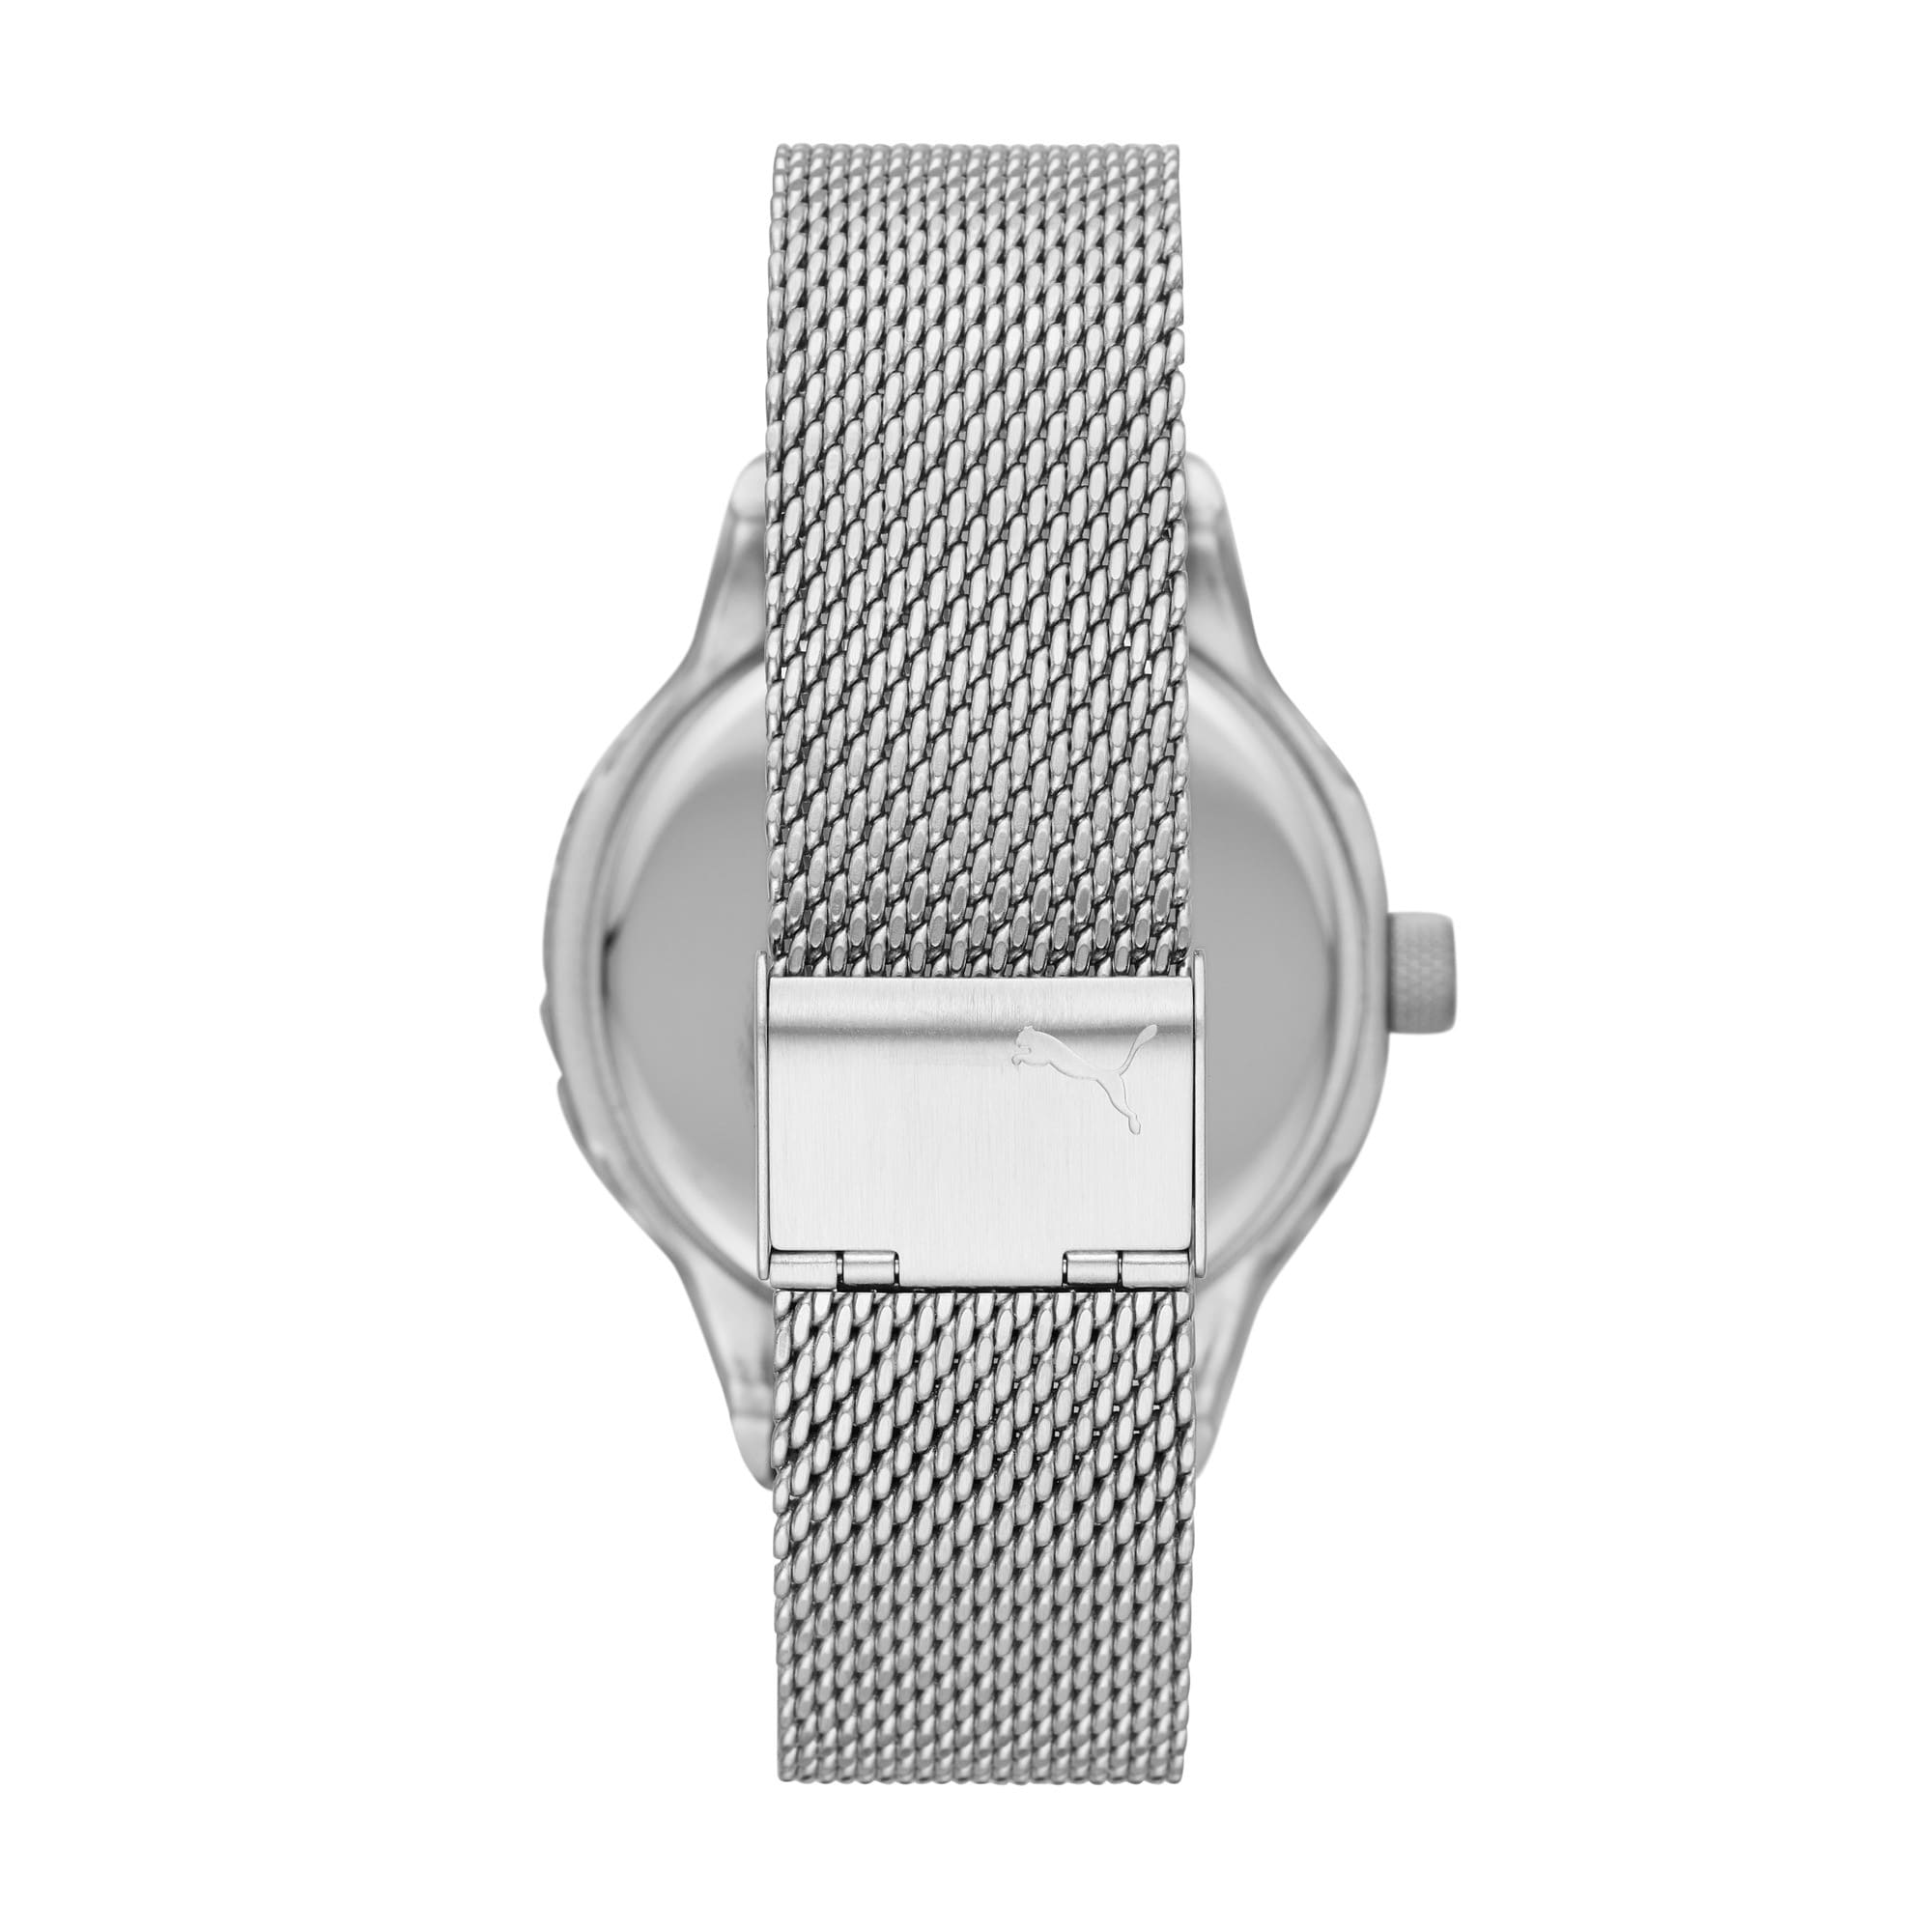 Thumbnail 2 of Reset v1 Watch, Silver/Silver, medium